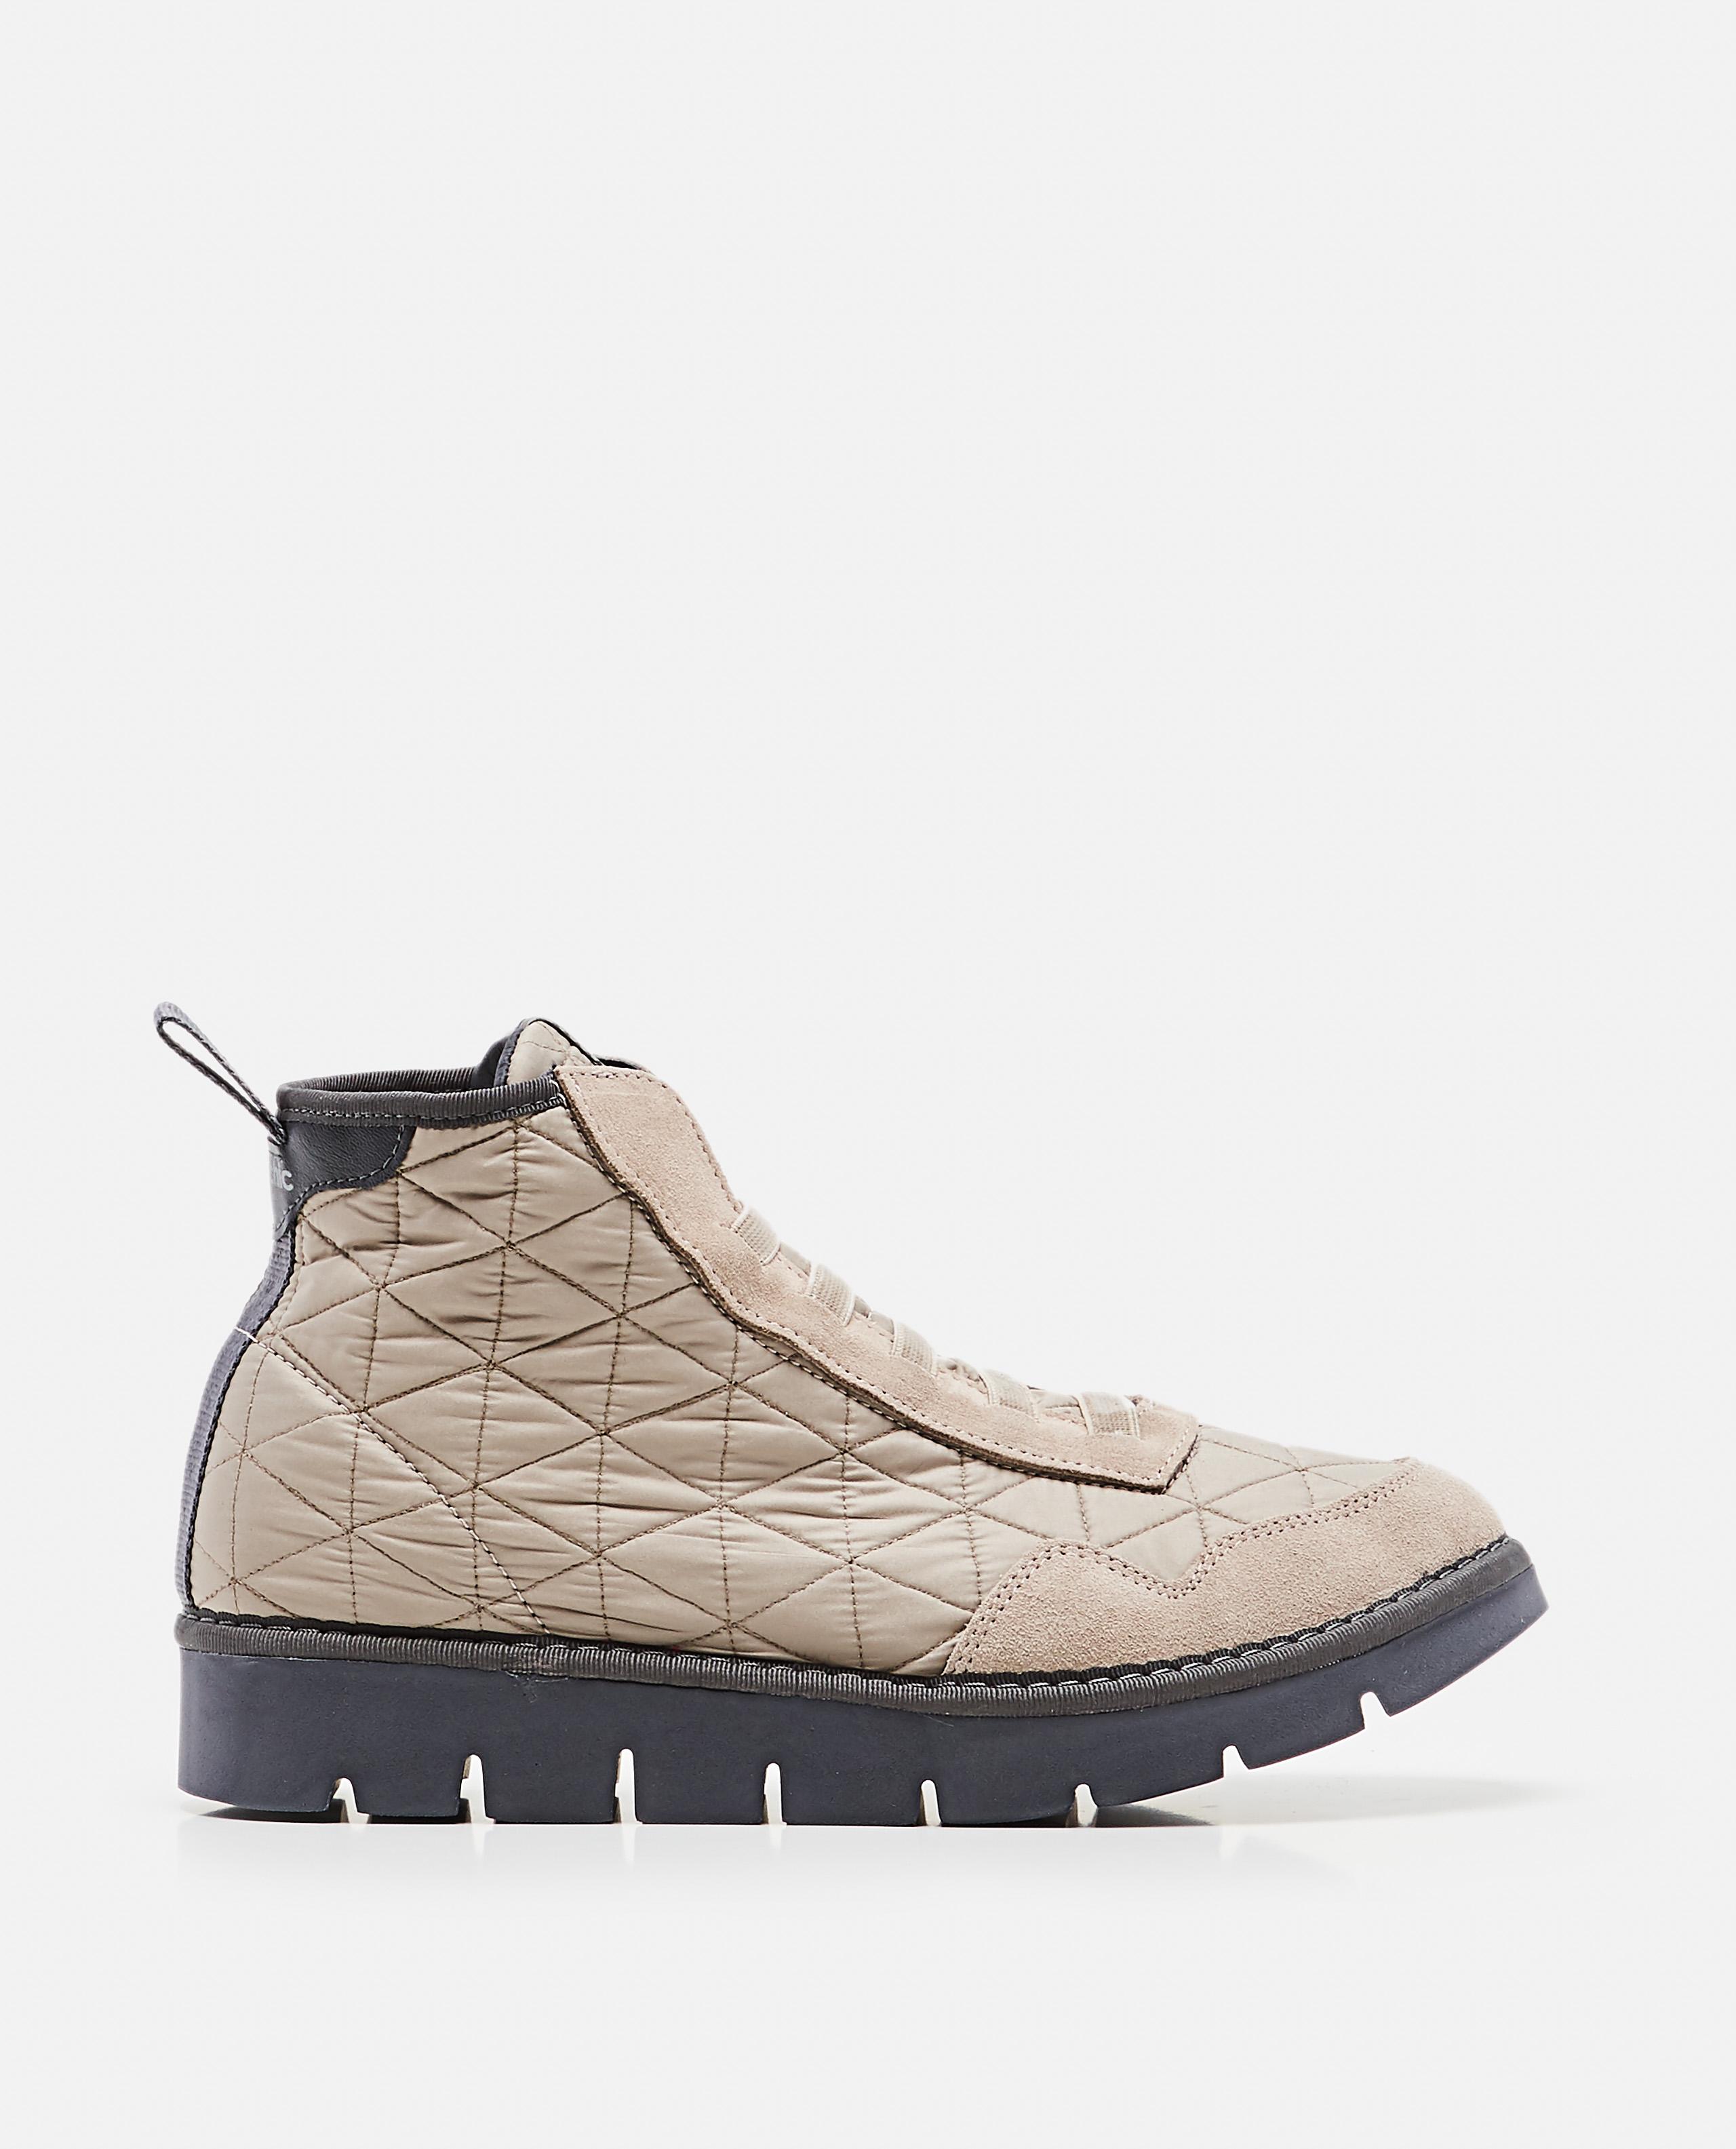 Nylon ankle boot